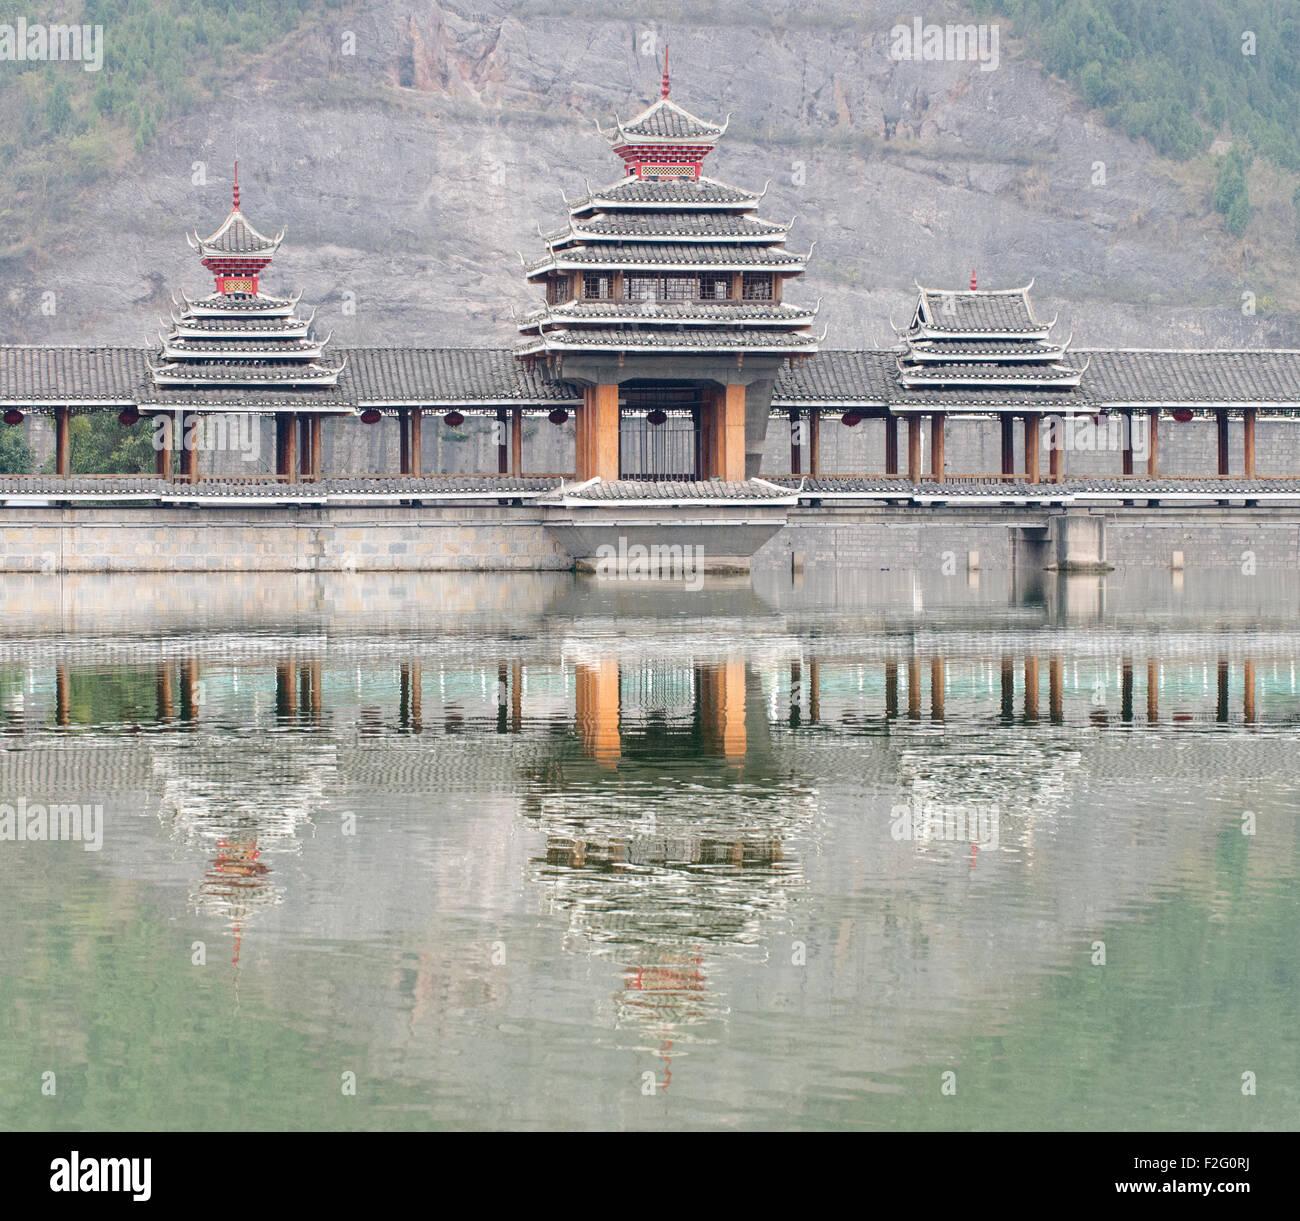 Bridge in Kaili, Guizhou, China Stock Photo